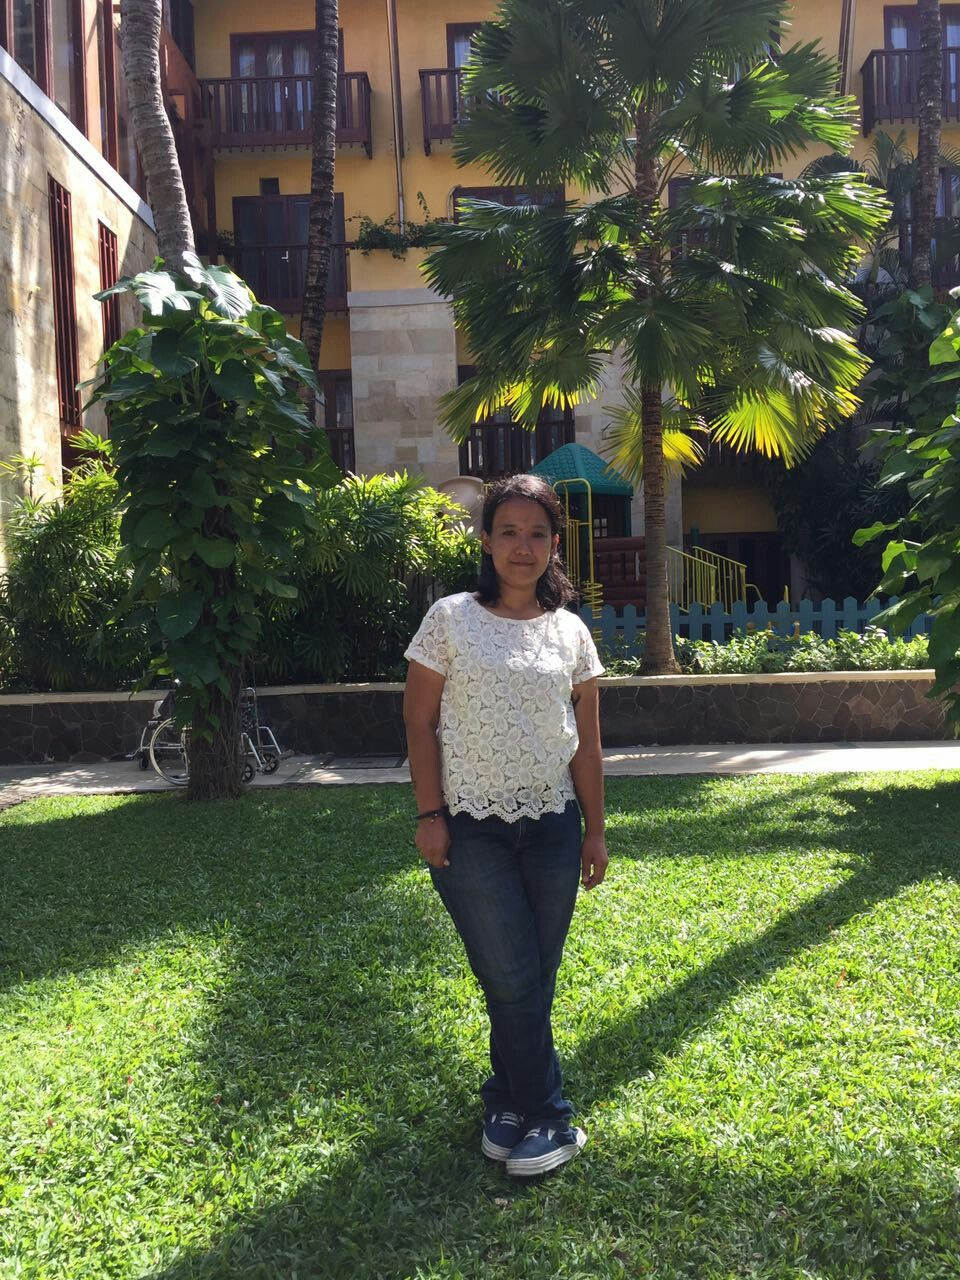 Garden park 5⭐hardrocks hotel bali.Kuta Beach. | This Is Lia ...